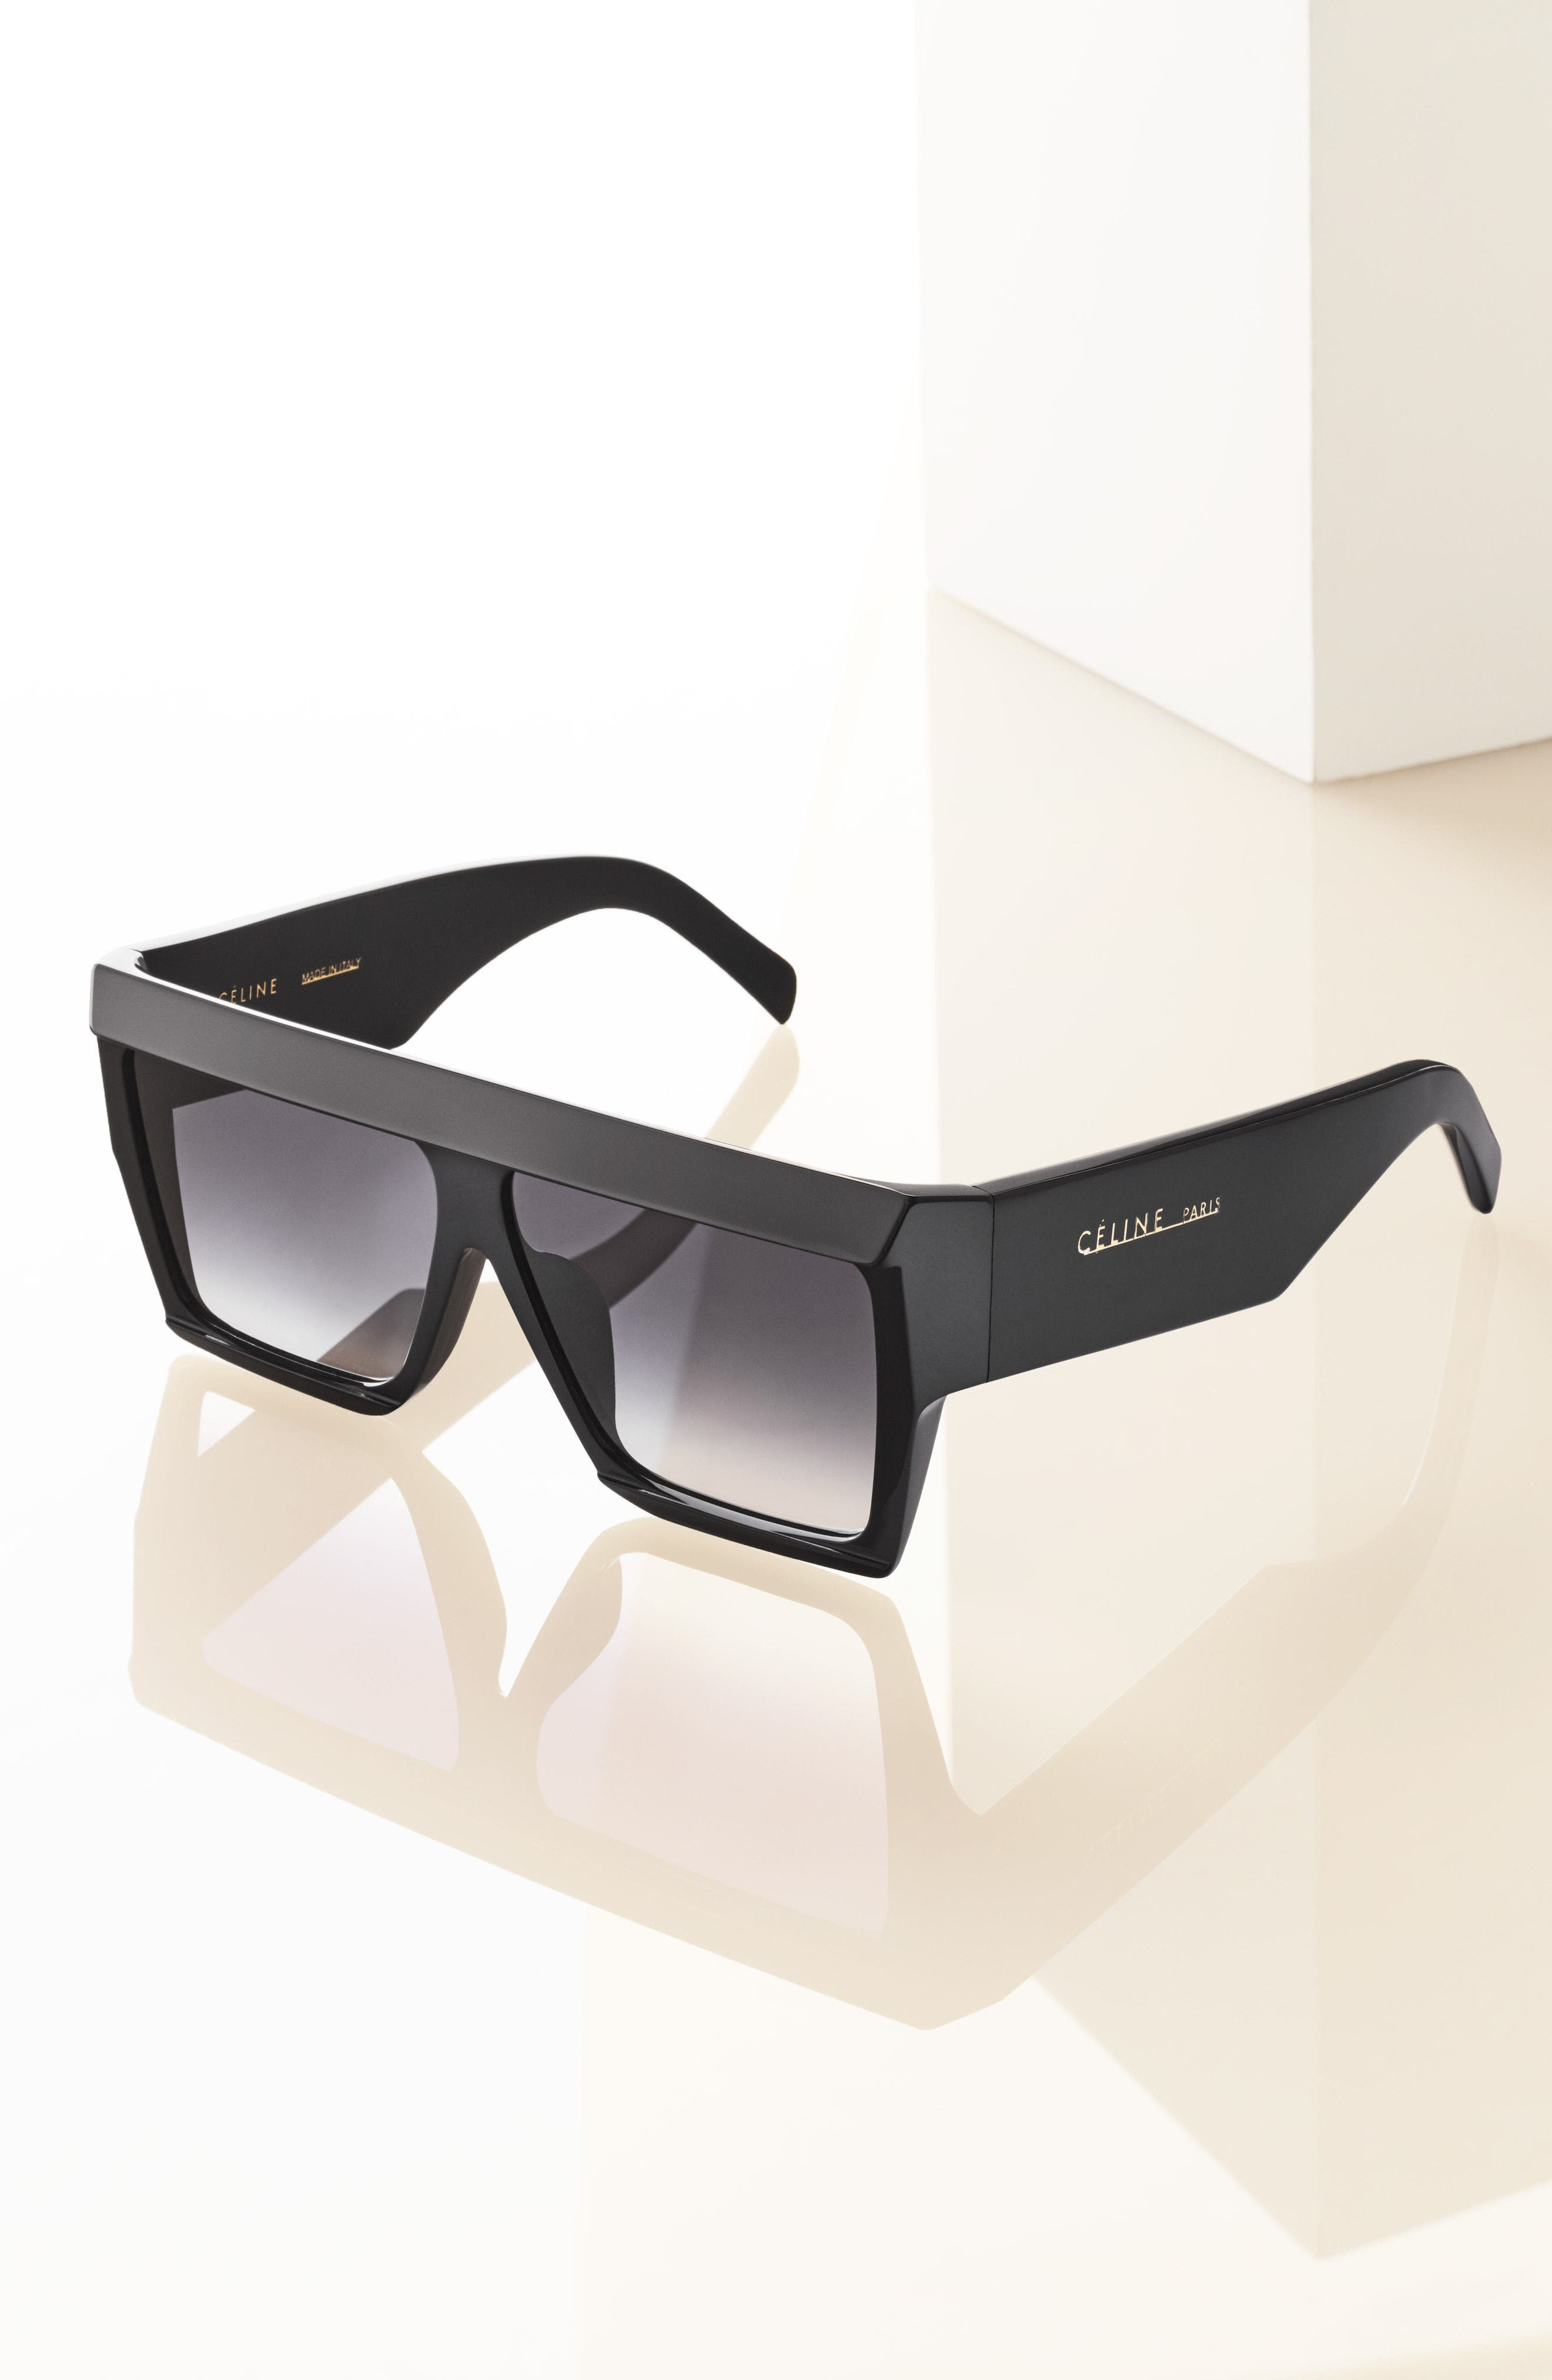 60mm Gradient Aviator Sunglasses,                             Alternate thumbnail 2, color,                             DARK HAVANA/ GOLD/ GREEN